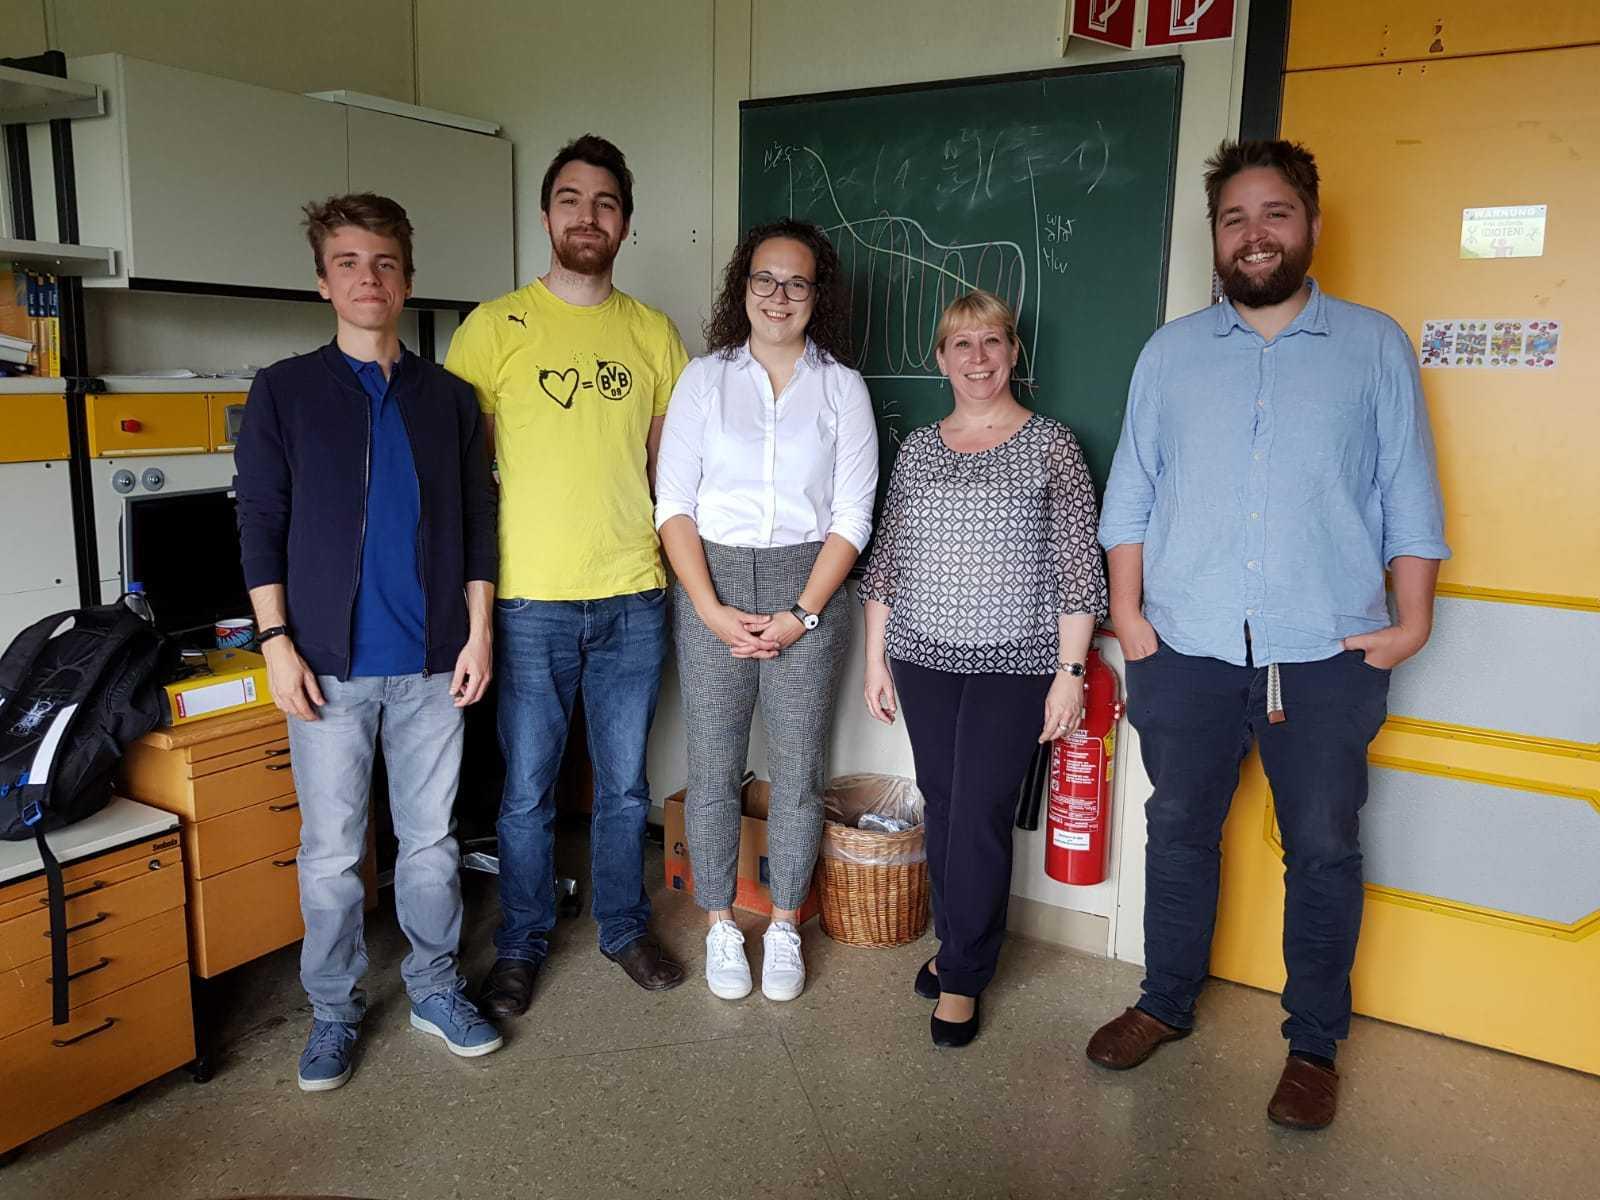 Sebastian Zieba, Thomas Steindl, Laura Ketzer, Konstanze Zwintz, Marco Müllner (from left to right) - September 2019